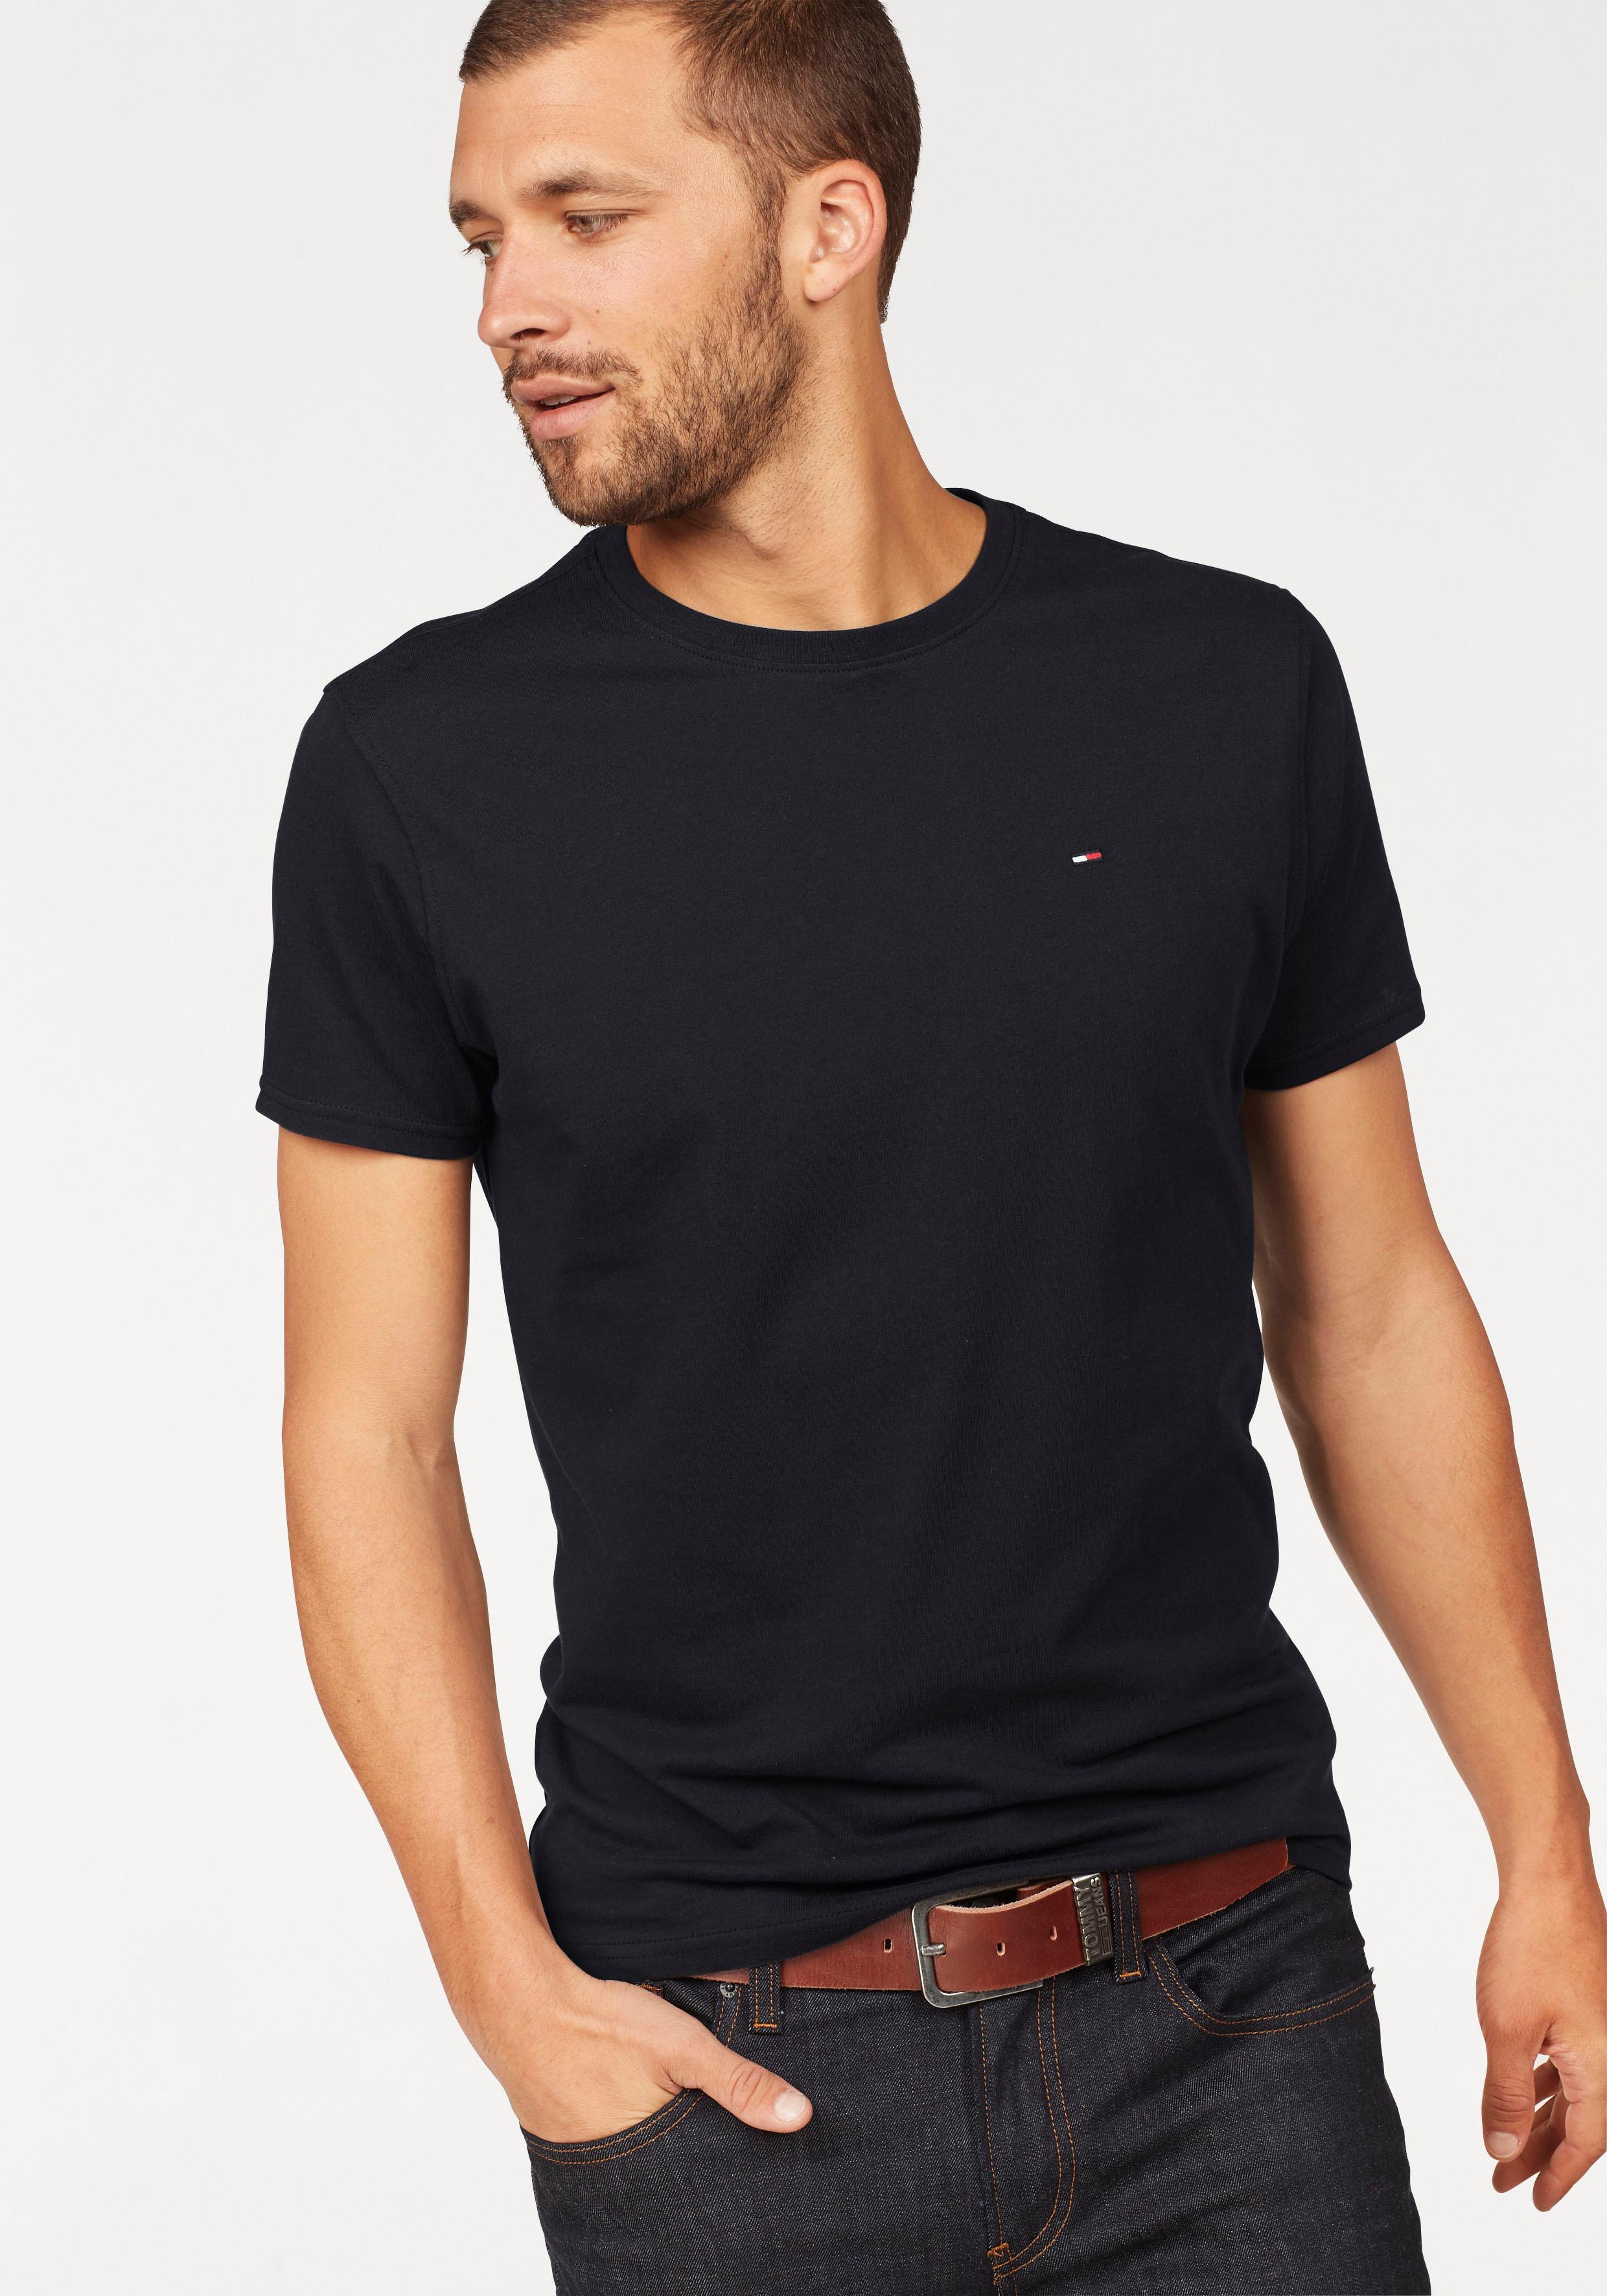 TOMMY JEANS T-Shirt TJM ORIGINAL JERSEY TEE | Bekleidung > Shirts > T-Shirts | Schwarz | Tommy Jeans